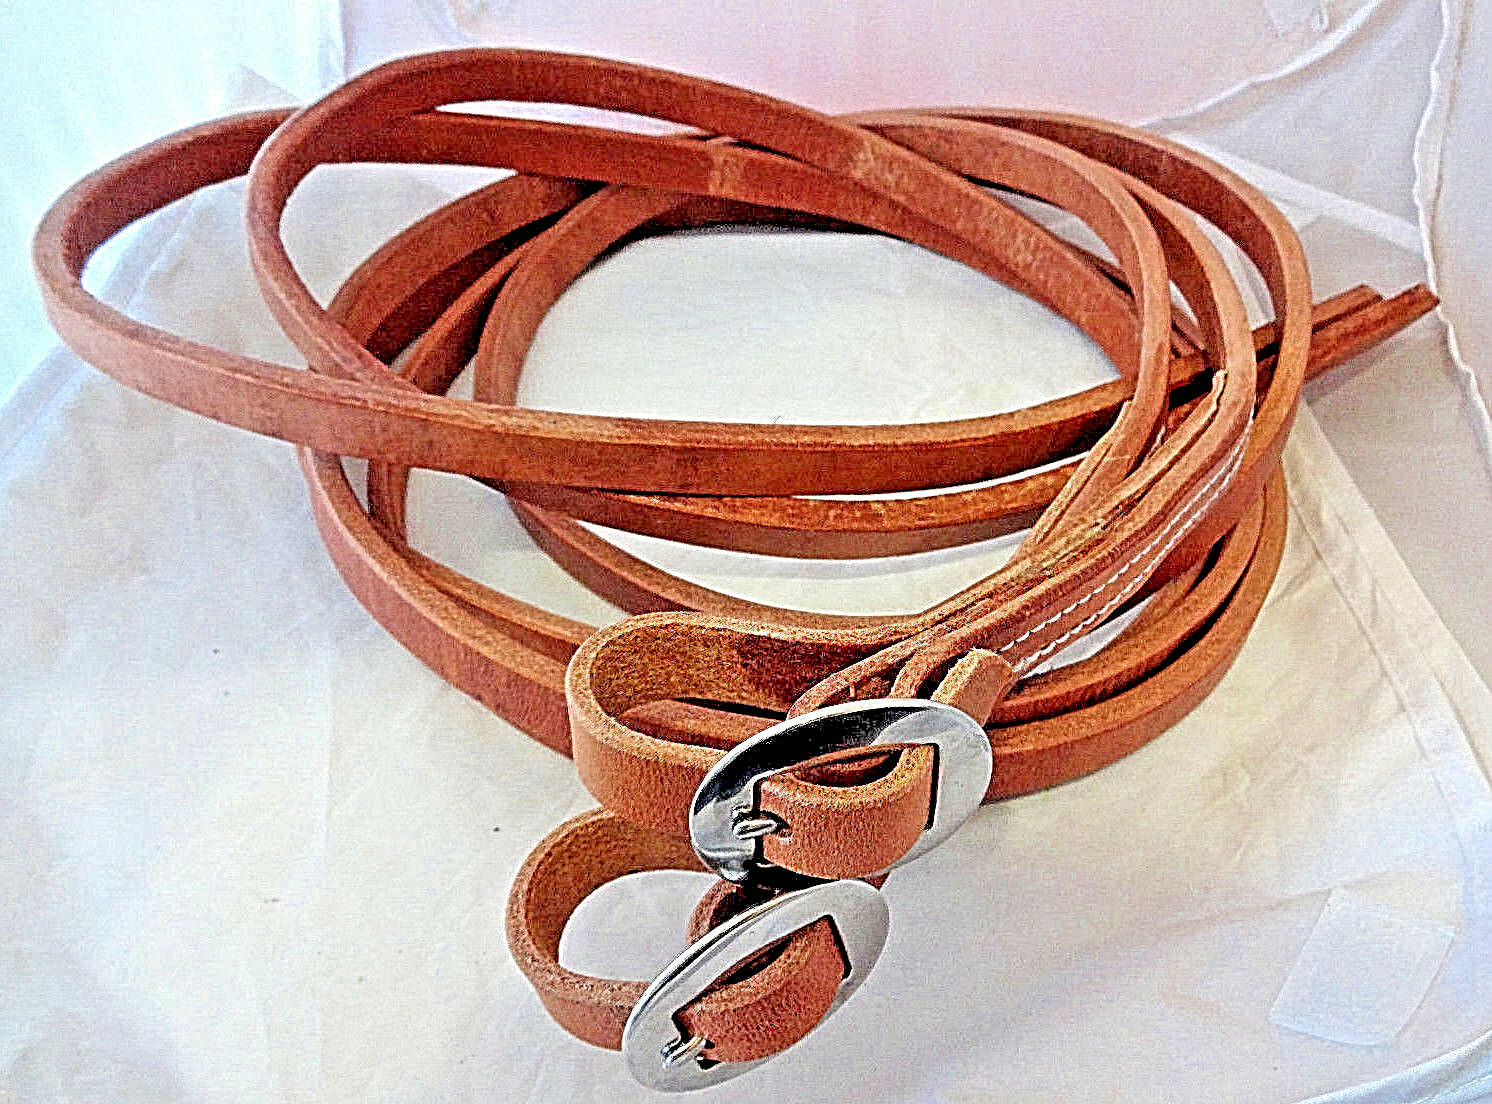 Pair Heavy Hermann Oak Harness Leather Split Reins Stainless Buckles 8ft+ 5 8